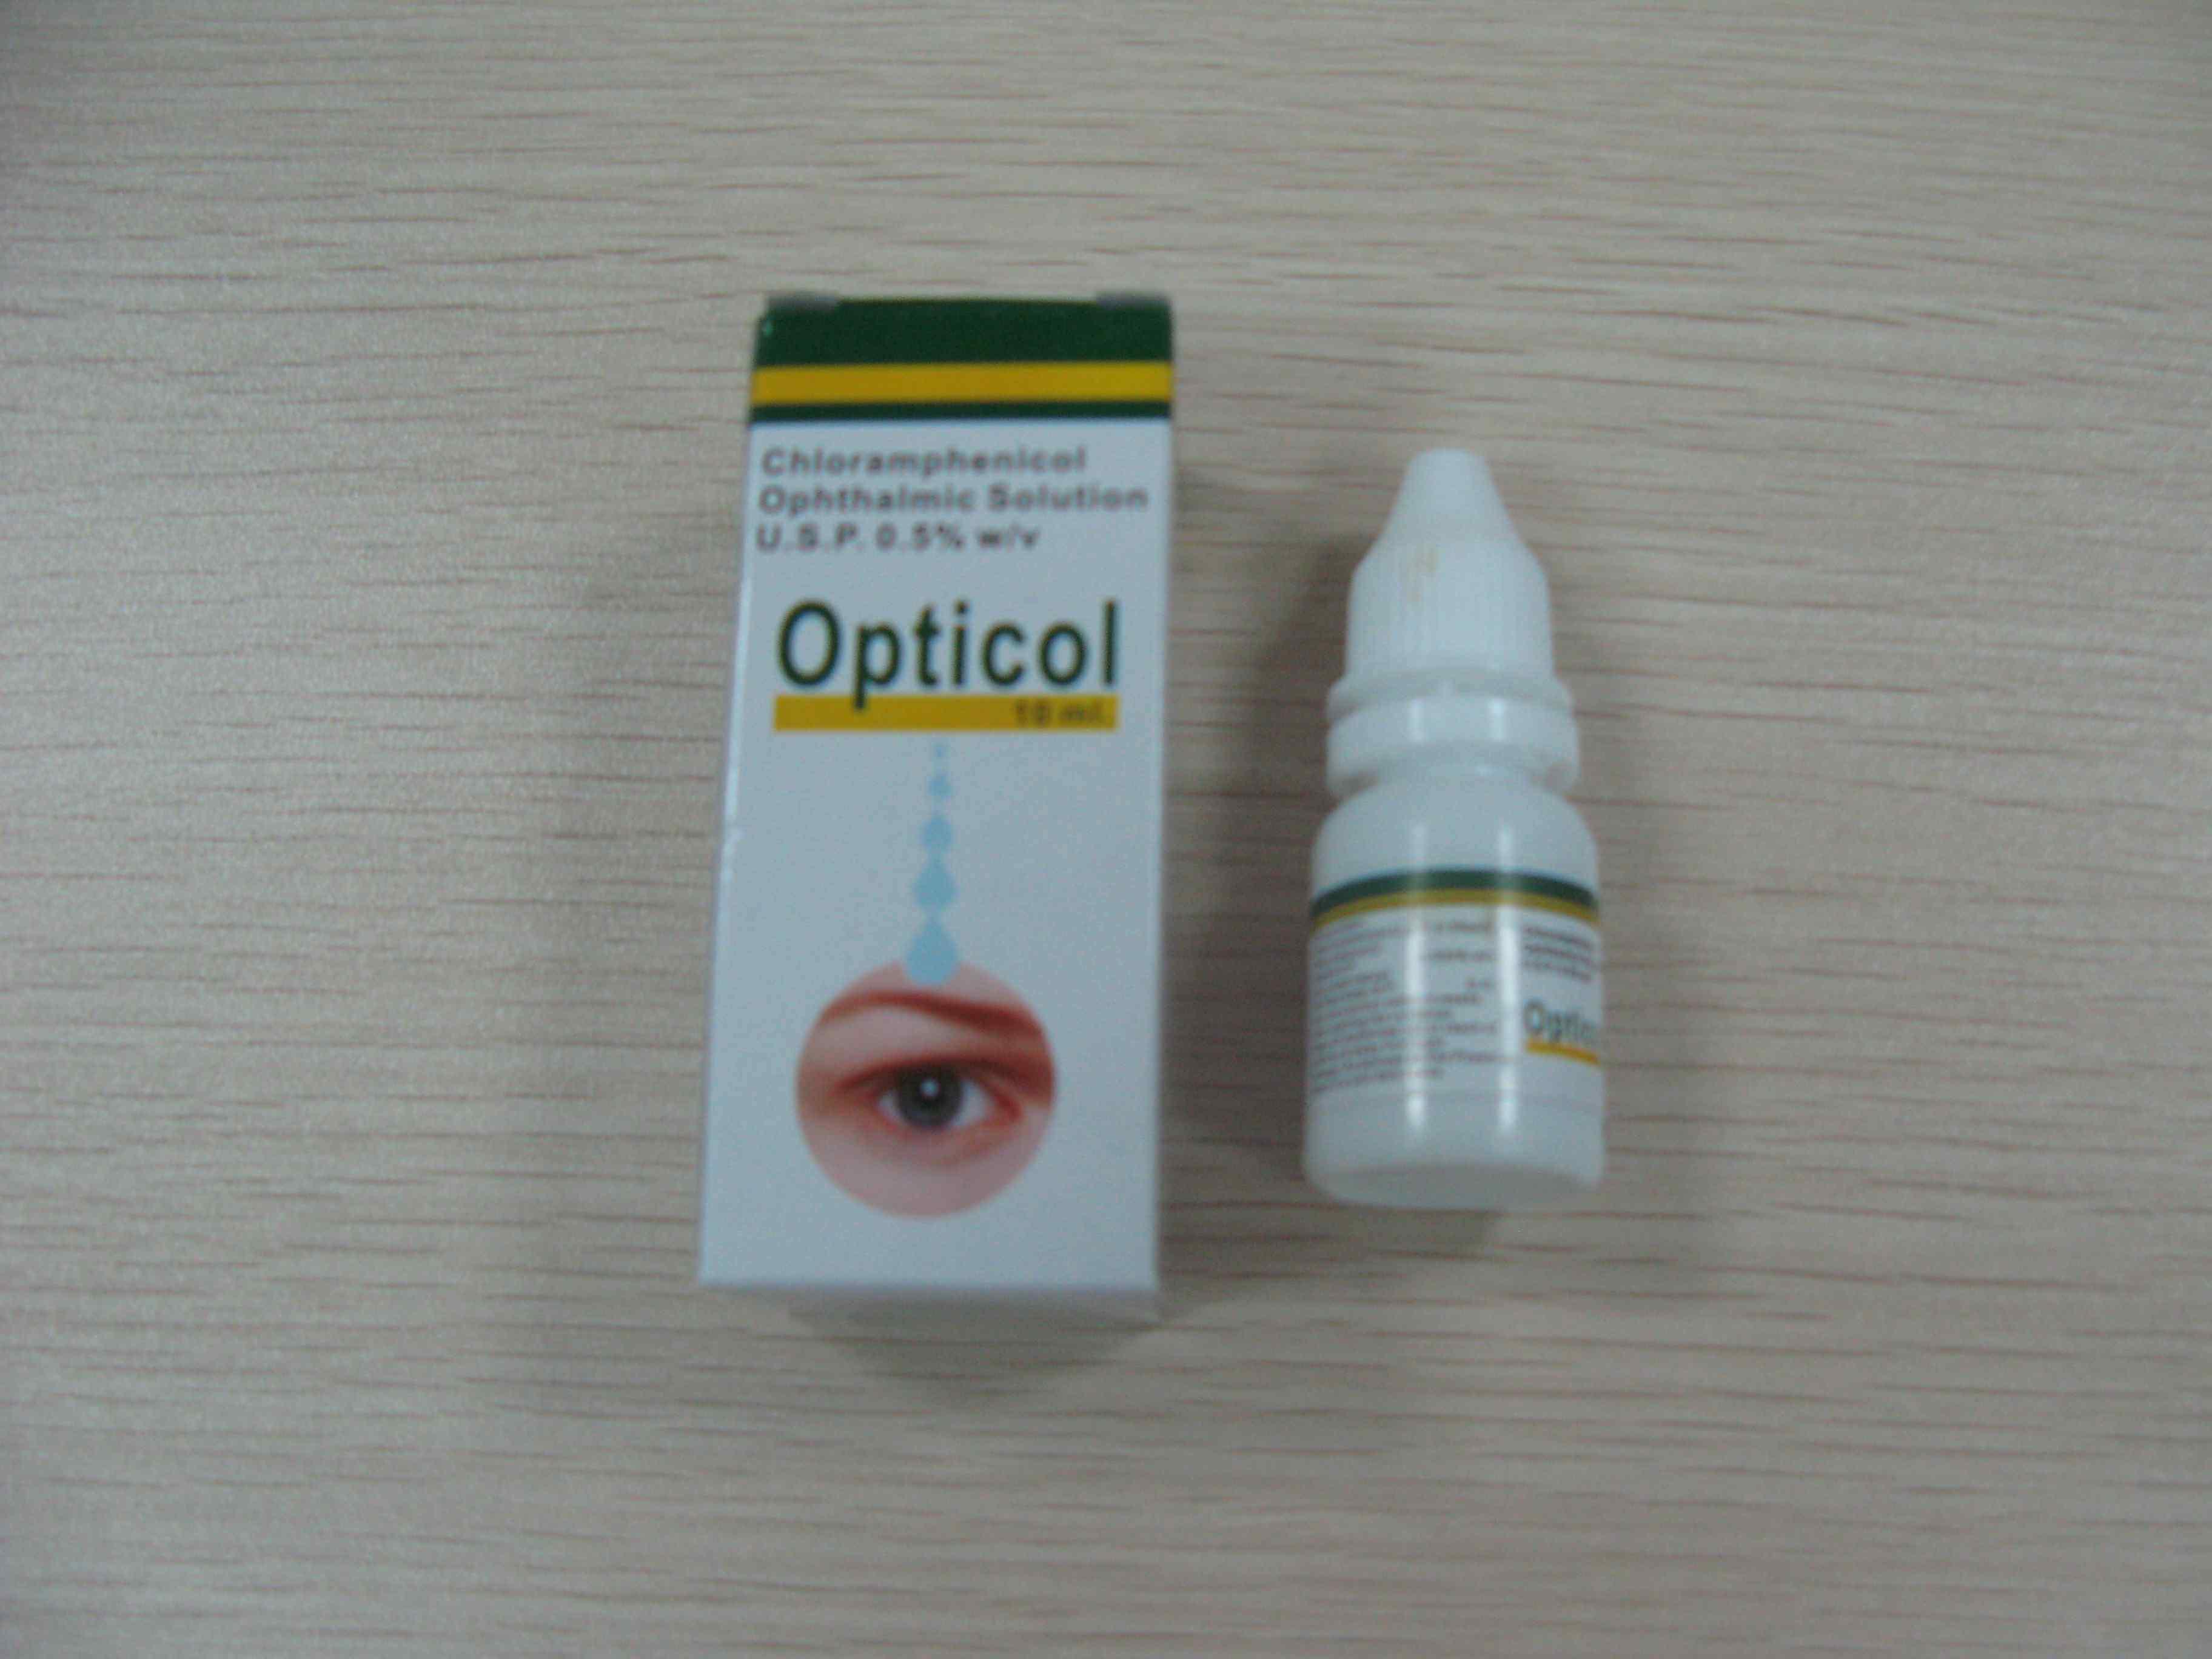 Chloramphenicol 250 Mg Tablets Atorvastatina Generico Peru